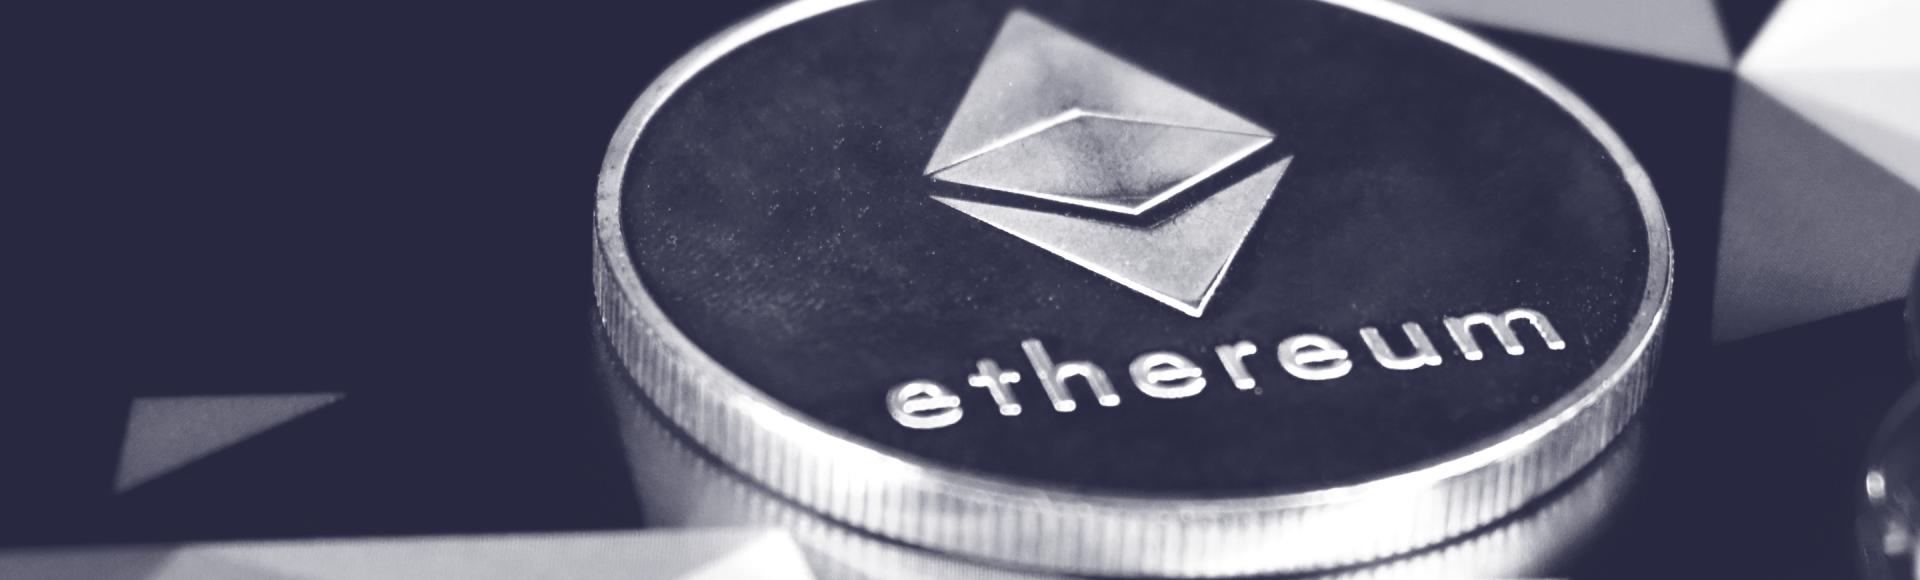 ARK-Invest_Blog-Banner_2016_08_22---Ethereum